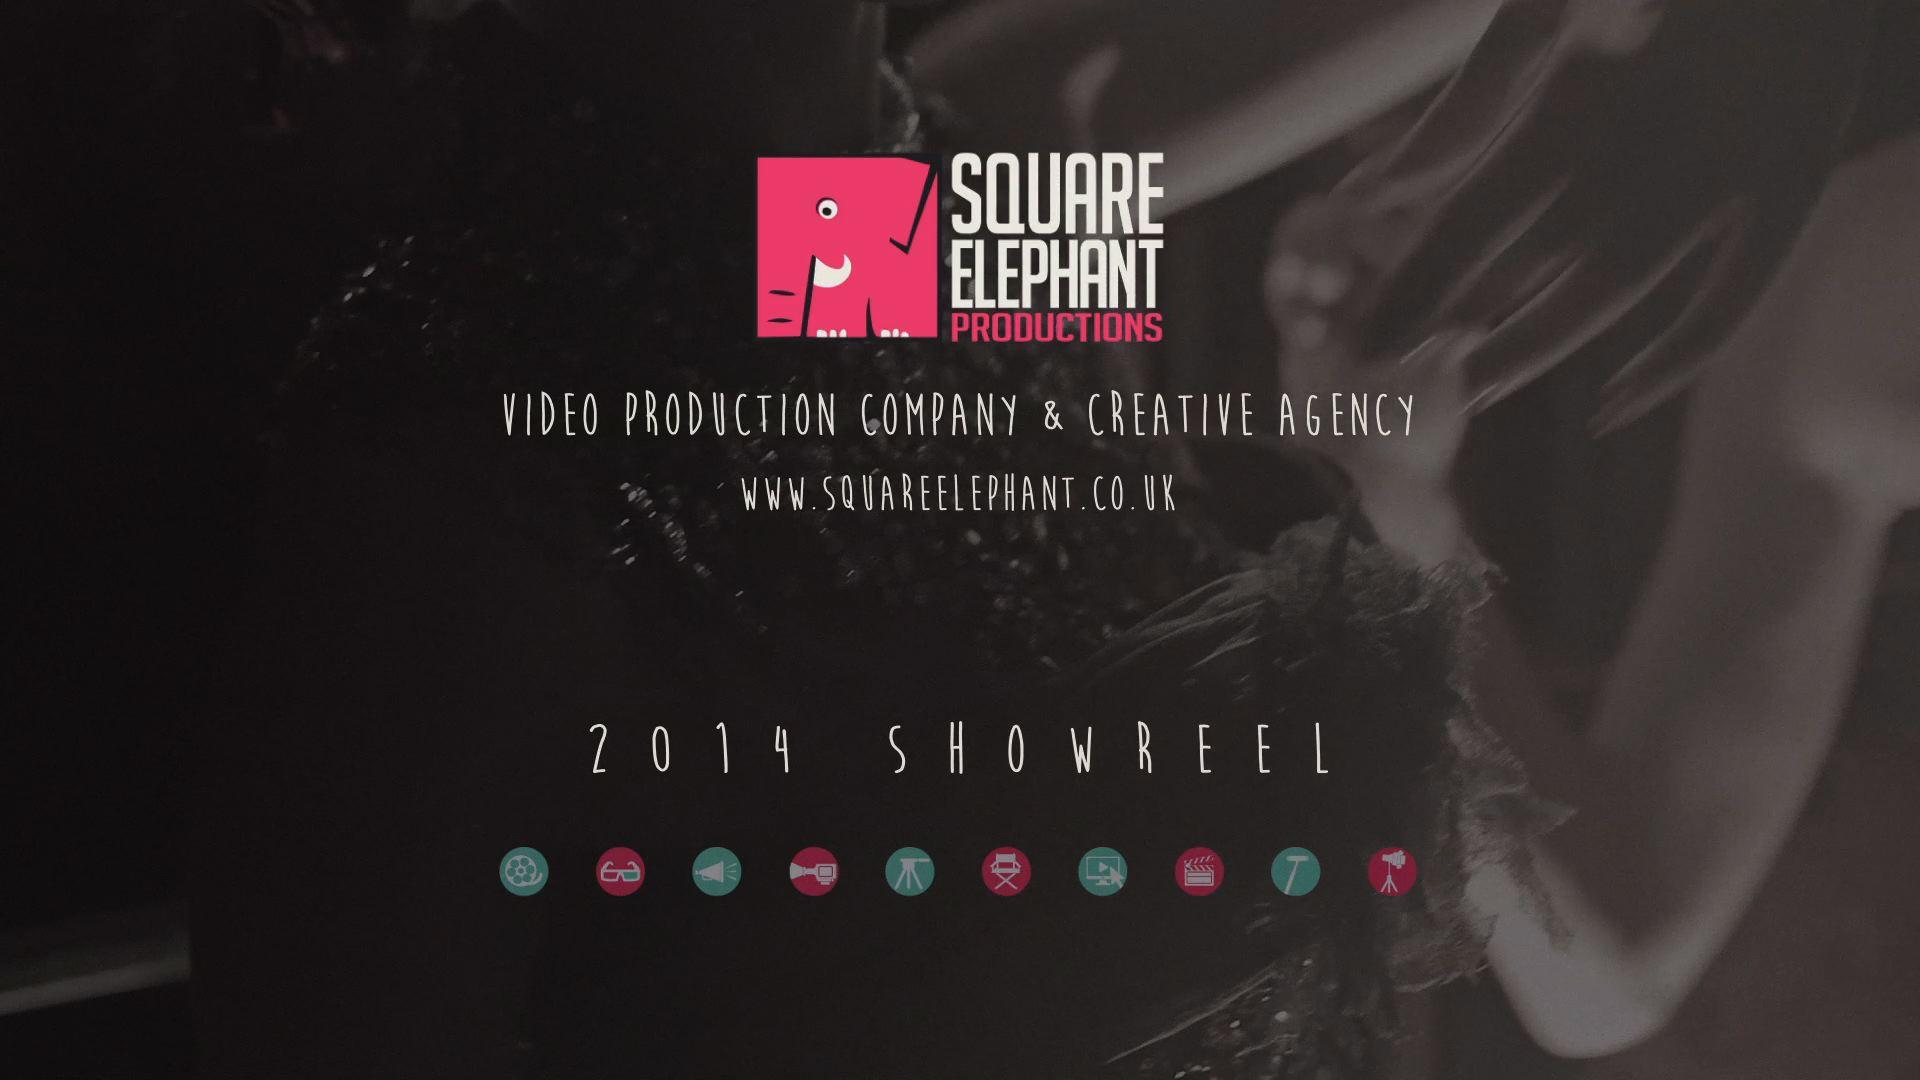 Square Elephant Productions Showreel 2014